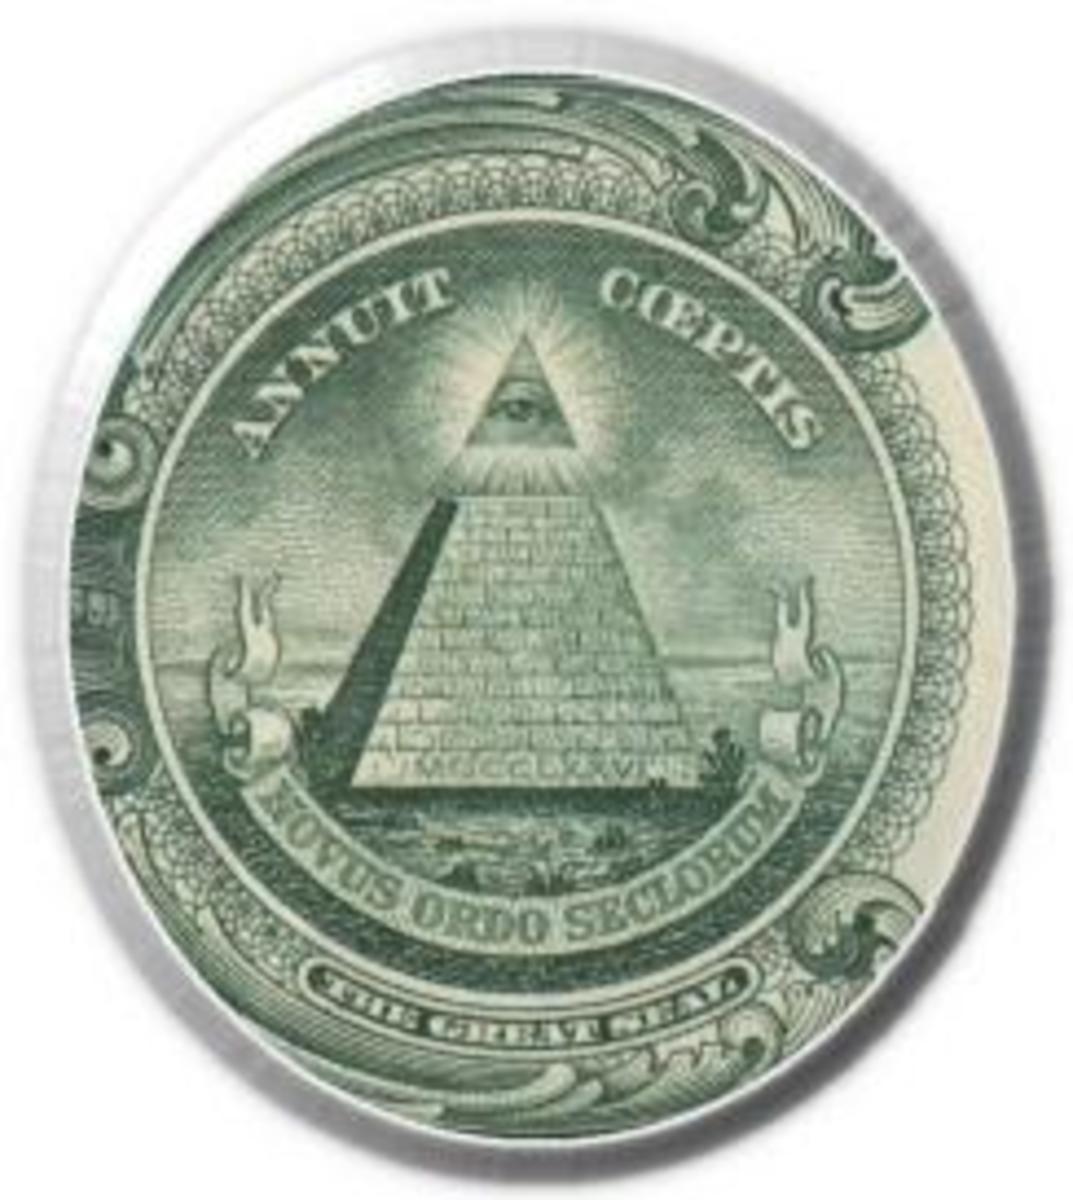 freemasons-and-the-symbols-on-the-dollar-bill